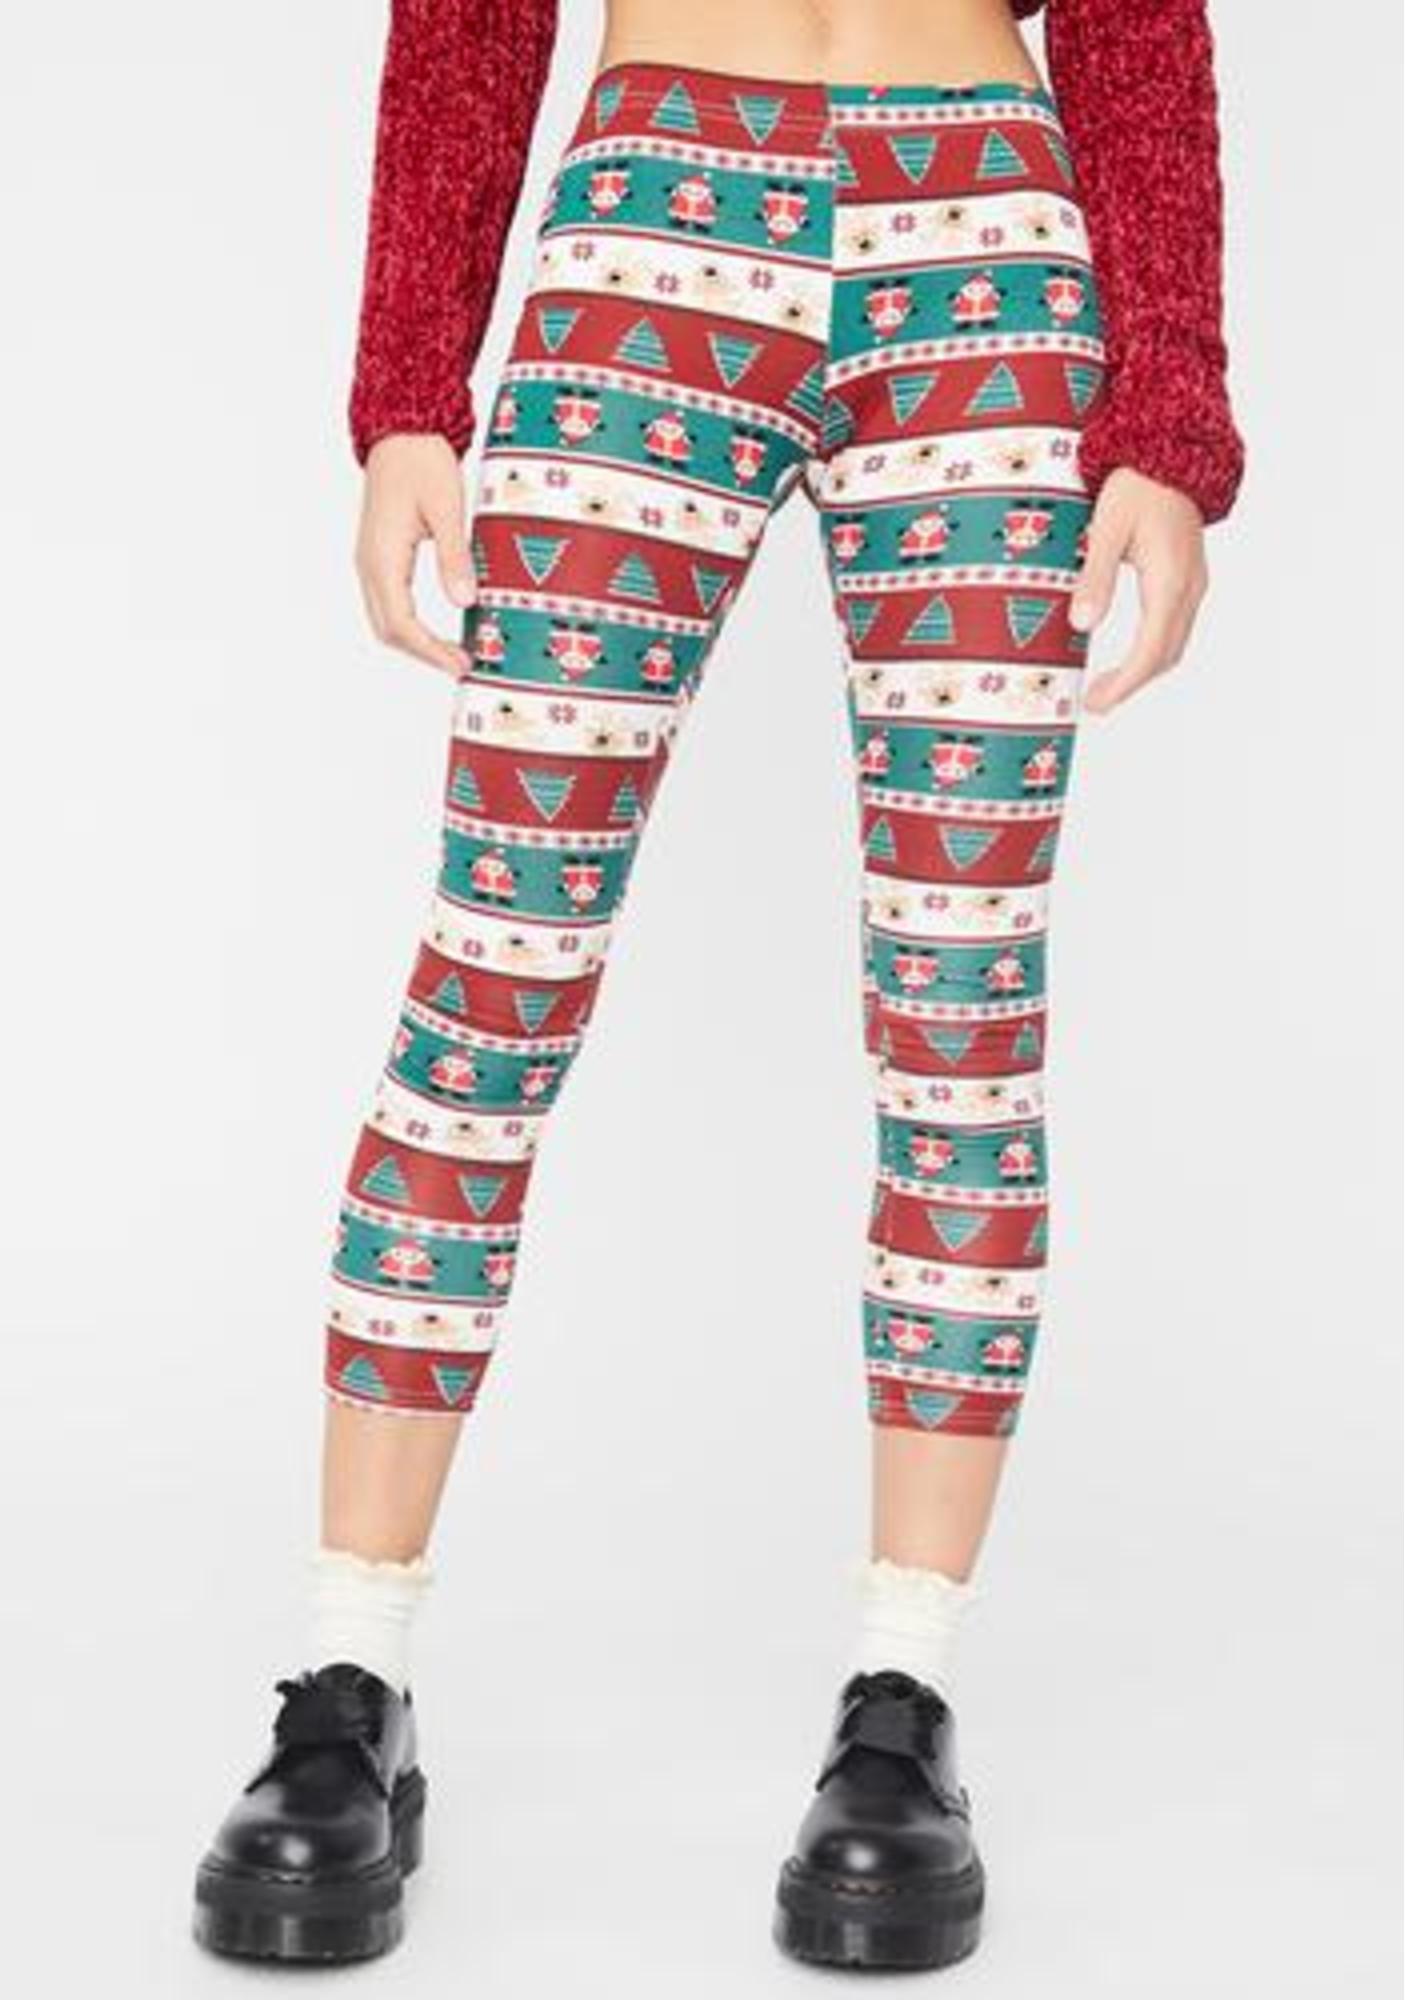 Sassy Santa Holiday Leggings